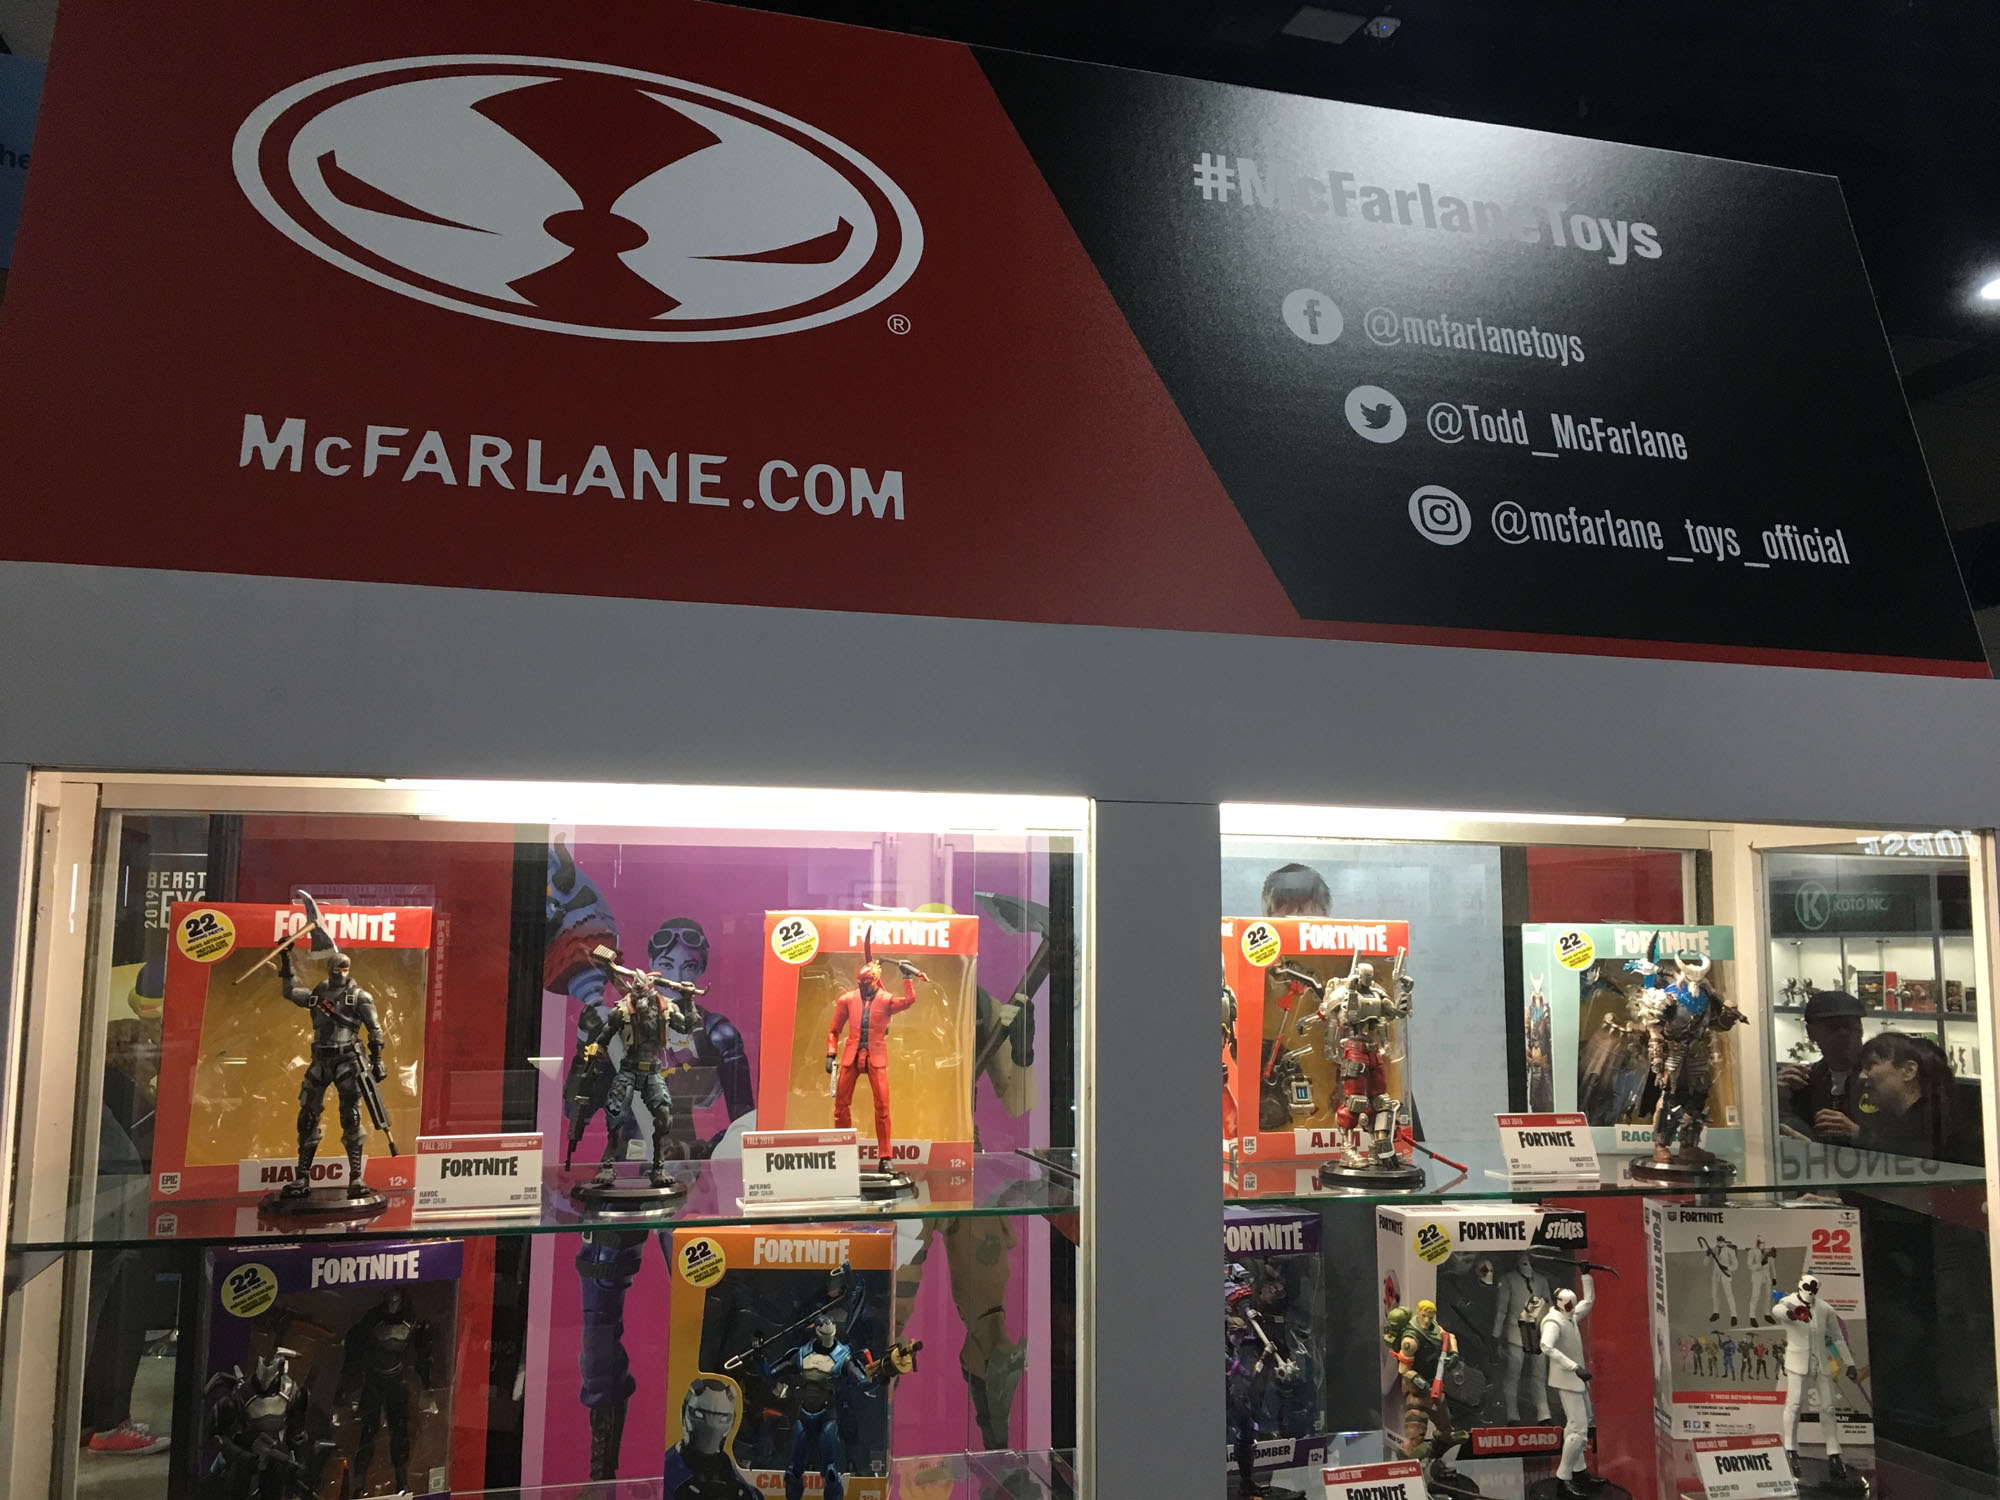 Mcfarlane Toys Mostra Novas Figuras De Mortal Kombat 11 Fortnite